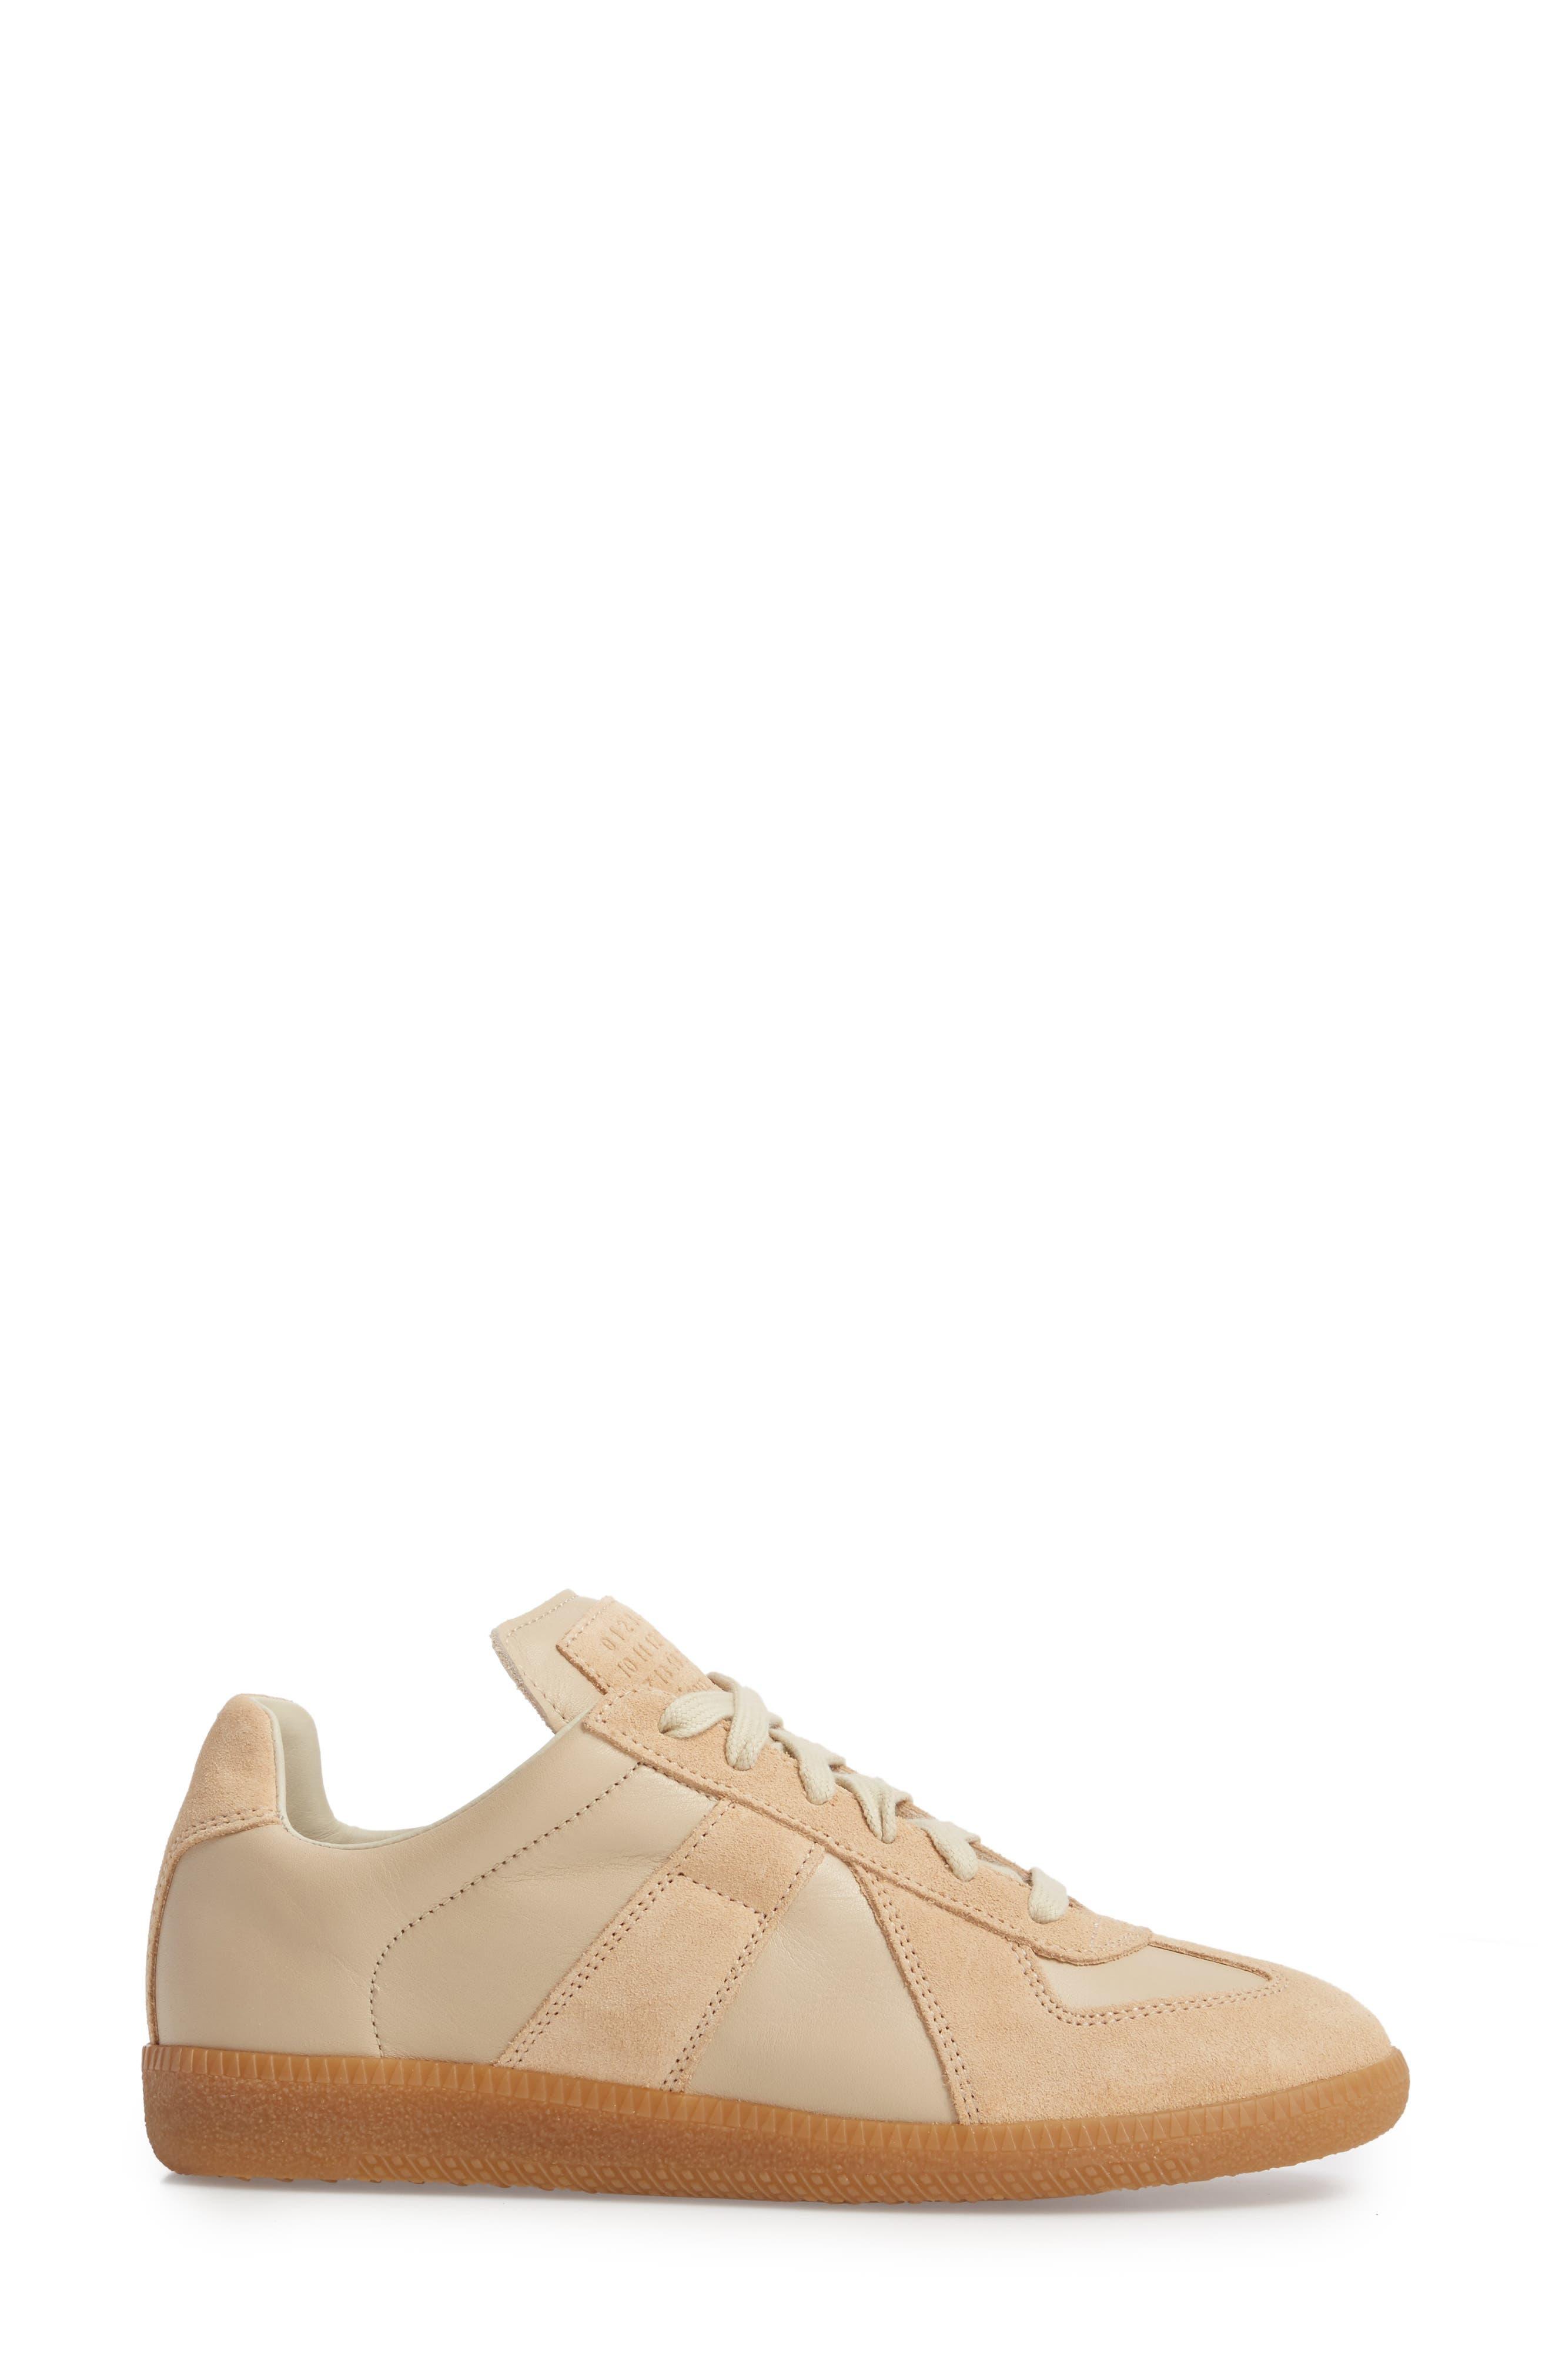 MAISON MARGIELA,                             Replica Sneaker,                             Alternate thumbnail 3, color,                             262